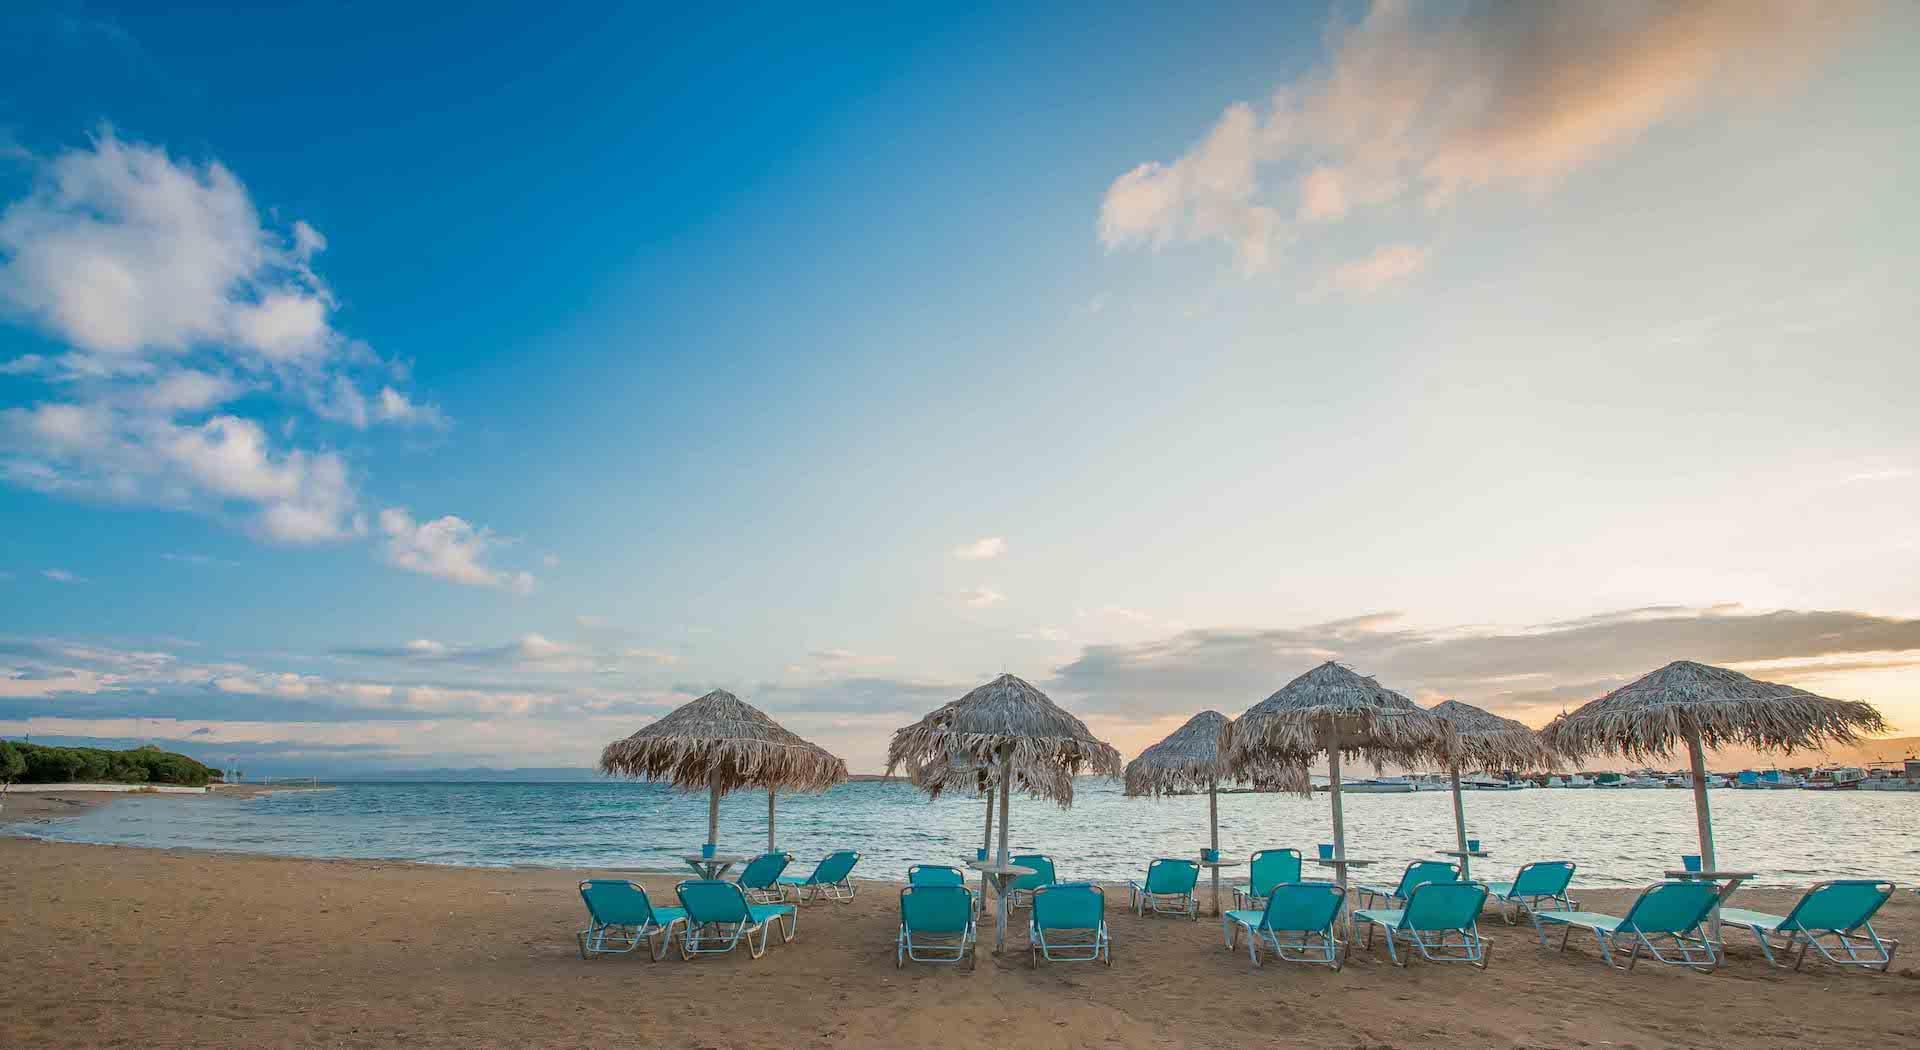 oasis-beach-photo2